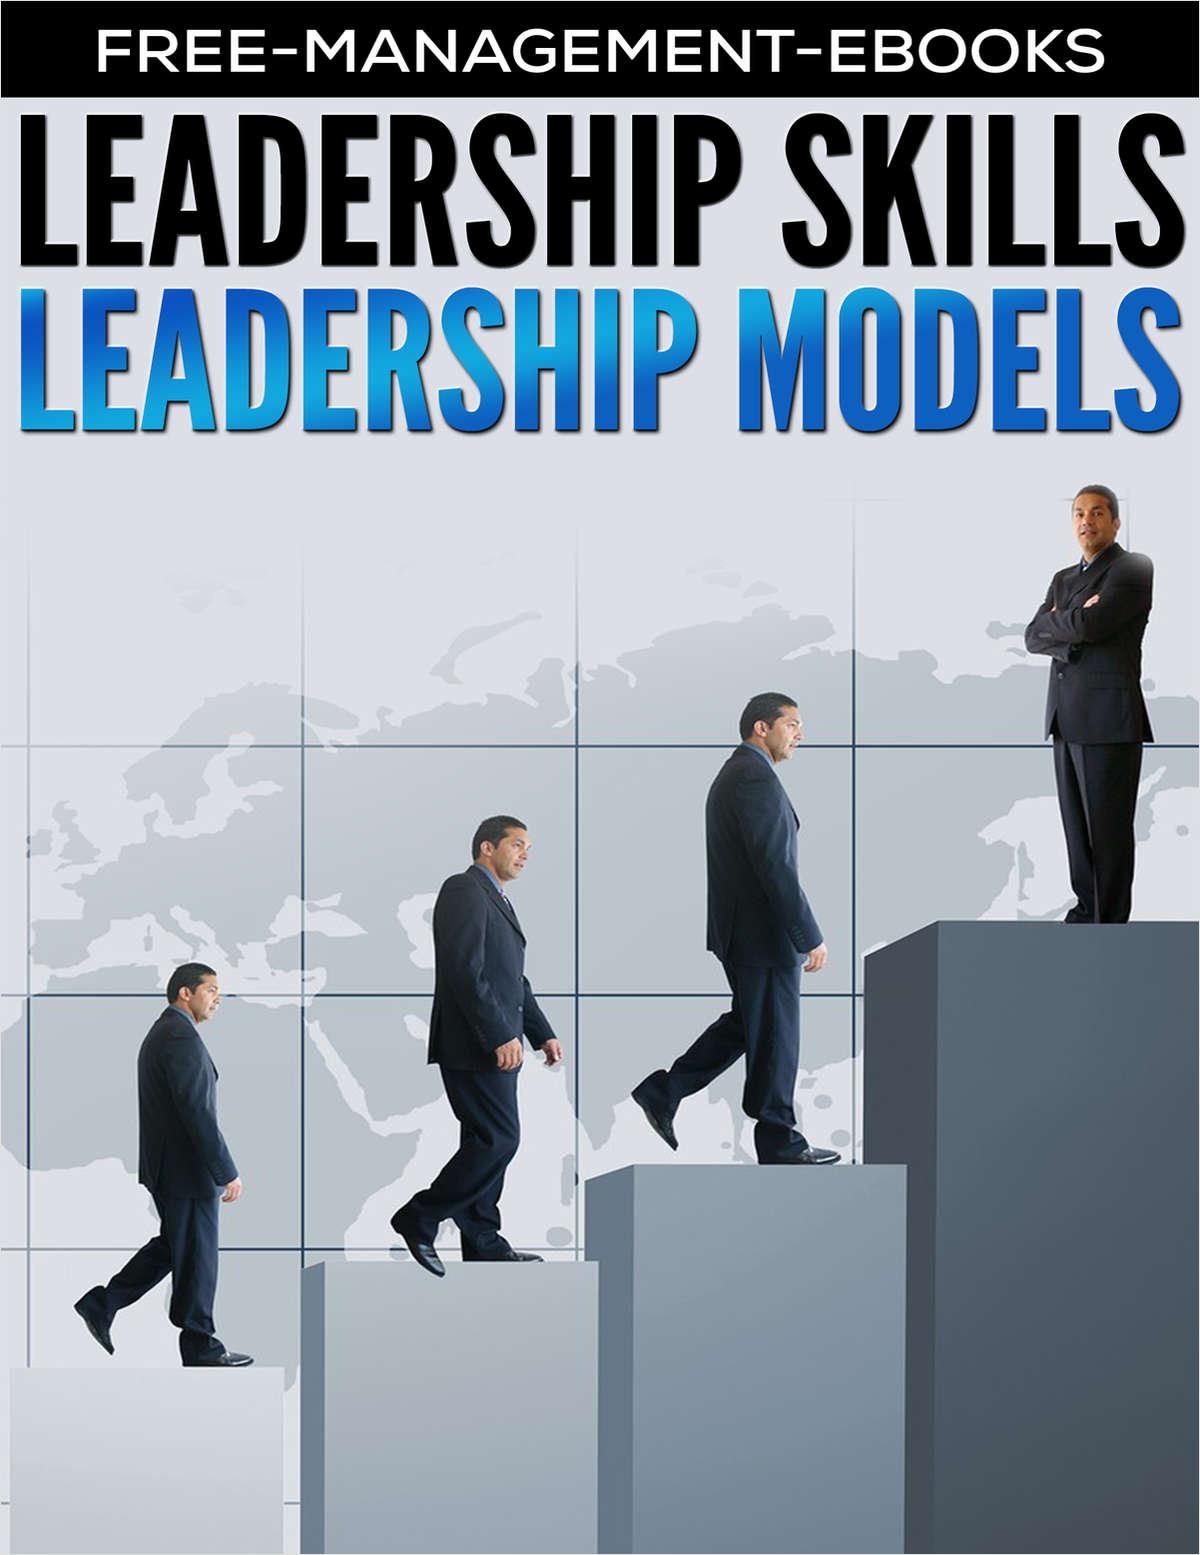 Leadership Models - Developing Your Leadership Skills